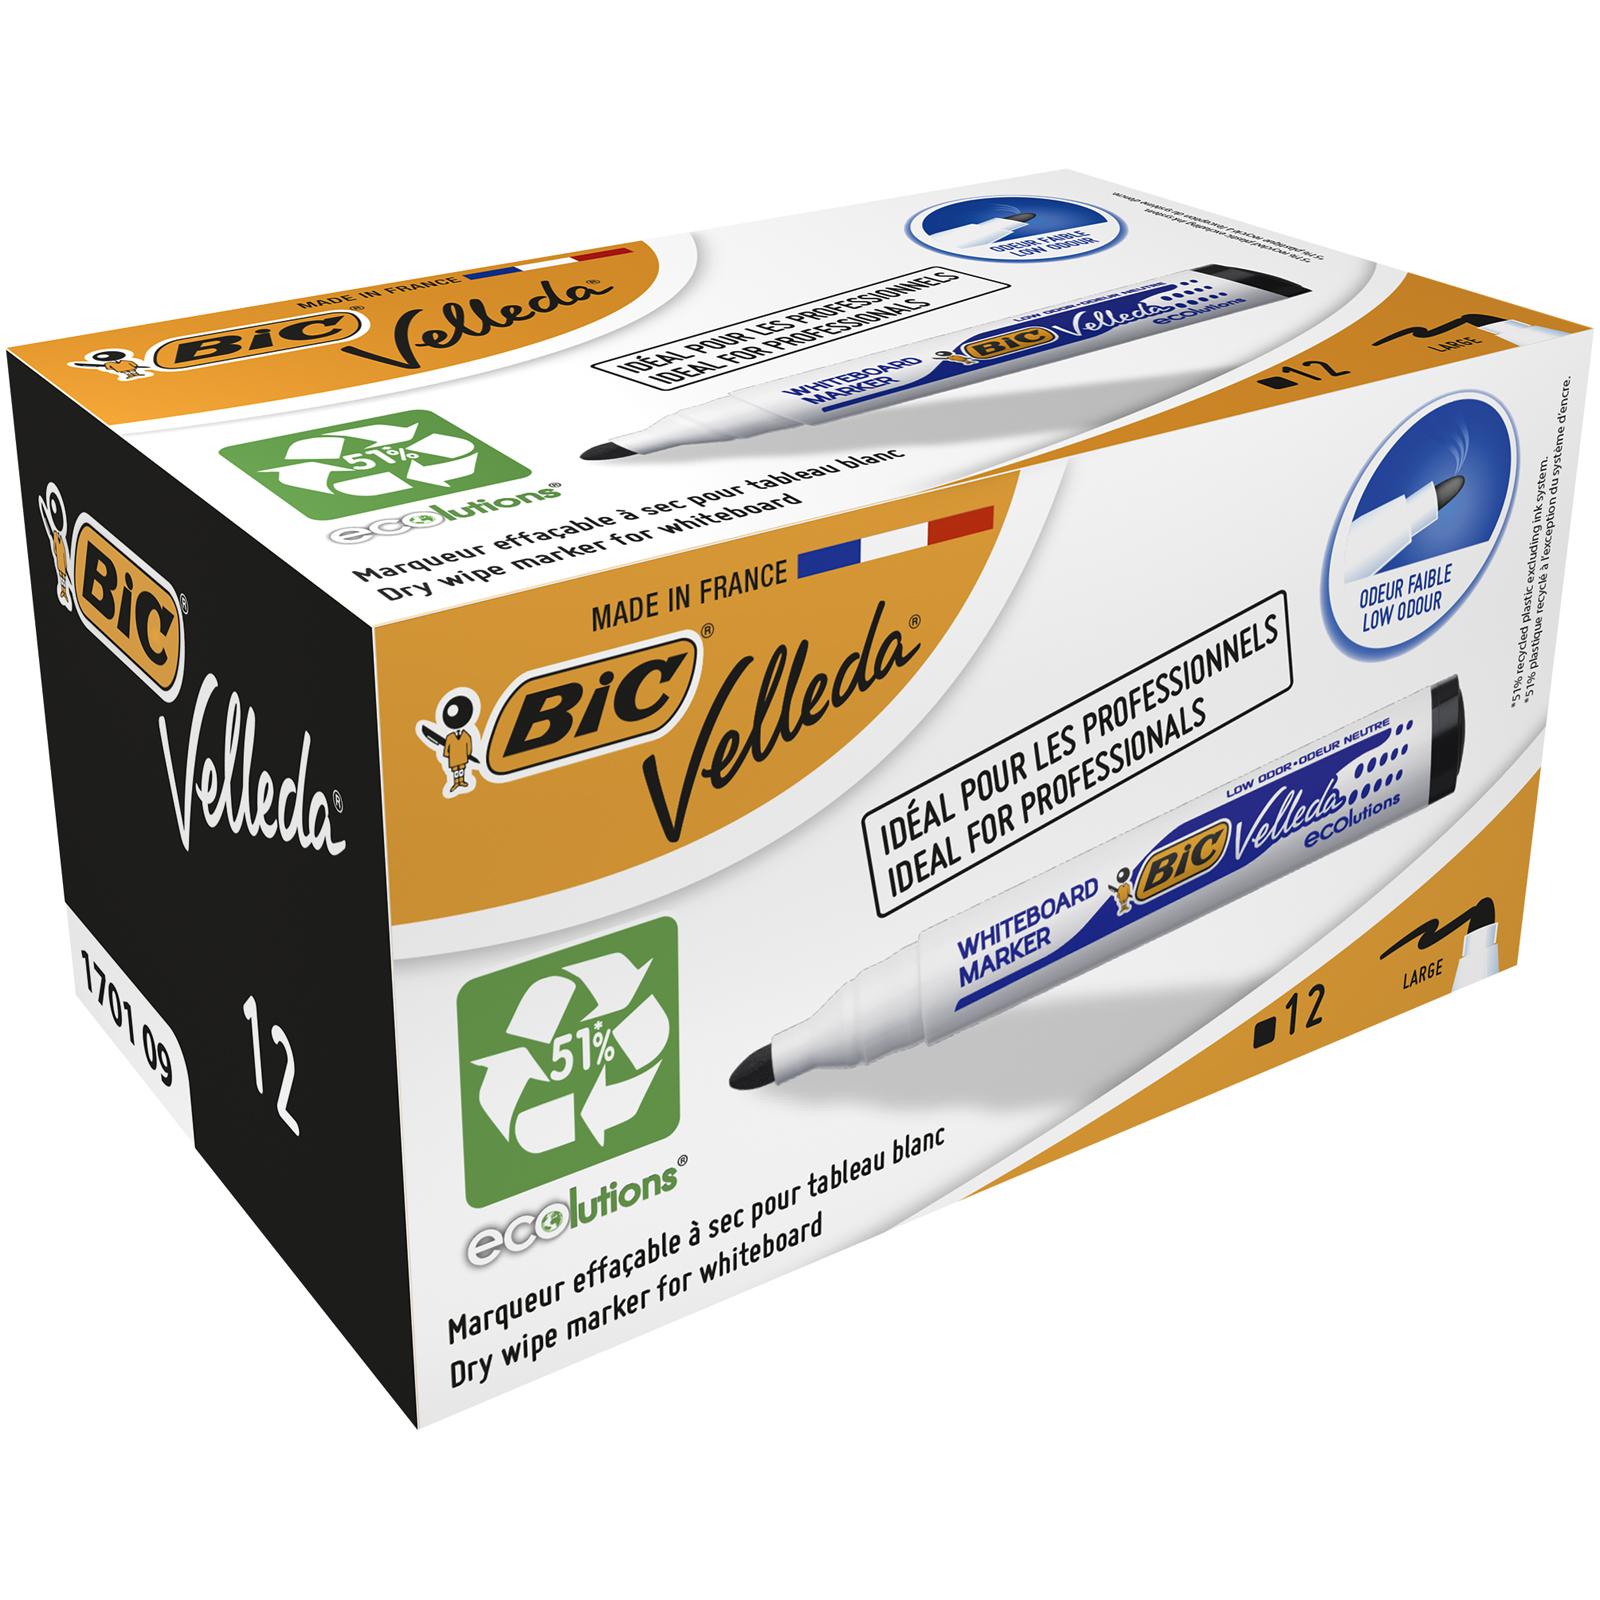 BIC VELLEDA 1701 - Pack de 12 marqueurs effaçables - pointe ogive - noir